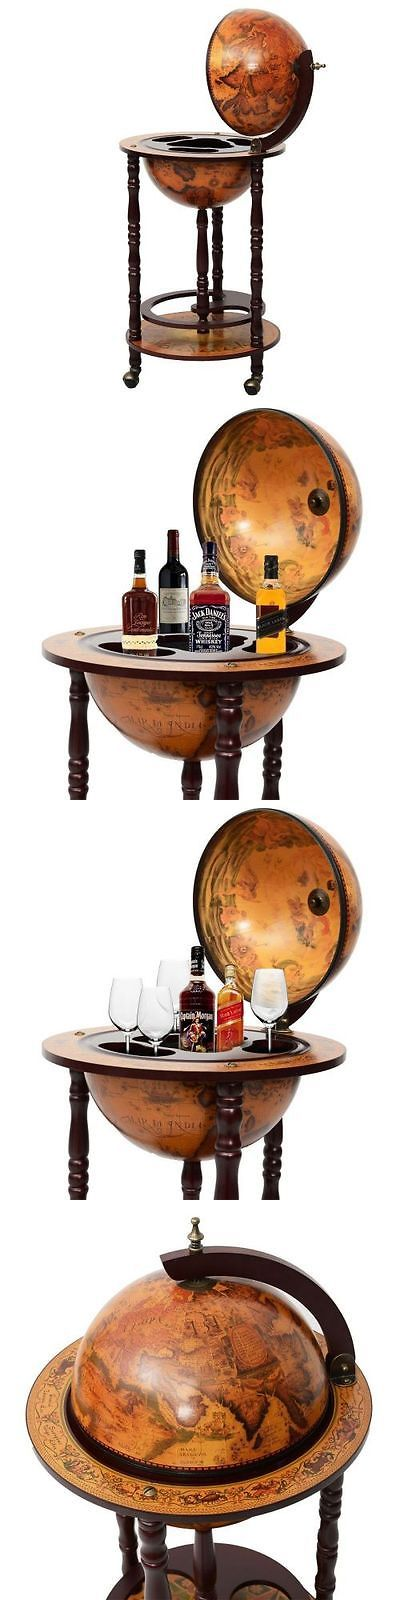 Wine Racks and Bottle Holders 20689: World Globe Wine Cabinet Bar Map Liquor Nautical Stand Mini Rolling Holder Decor -> BUY IT NOW ONLY: $85.47 on eBay!